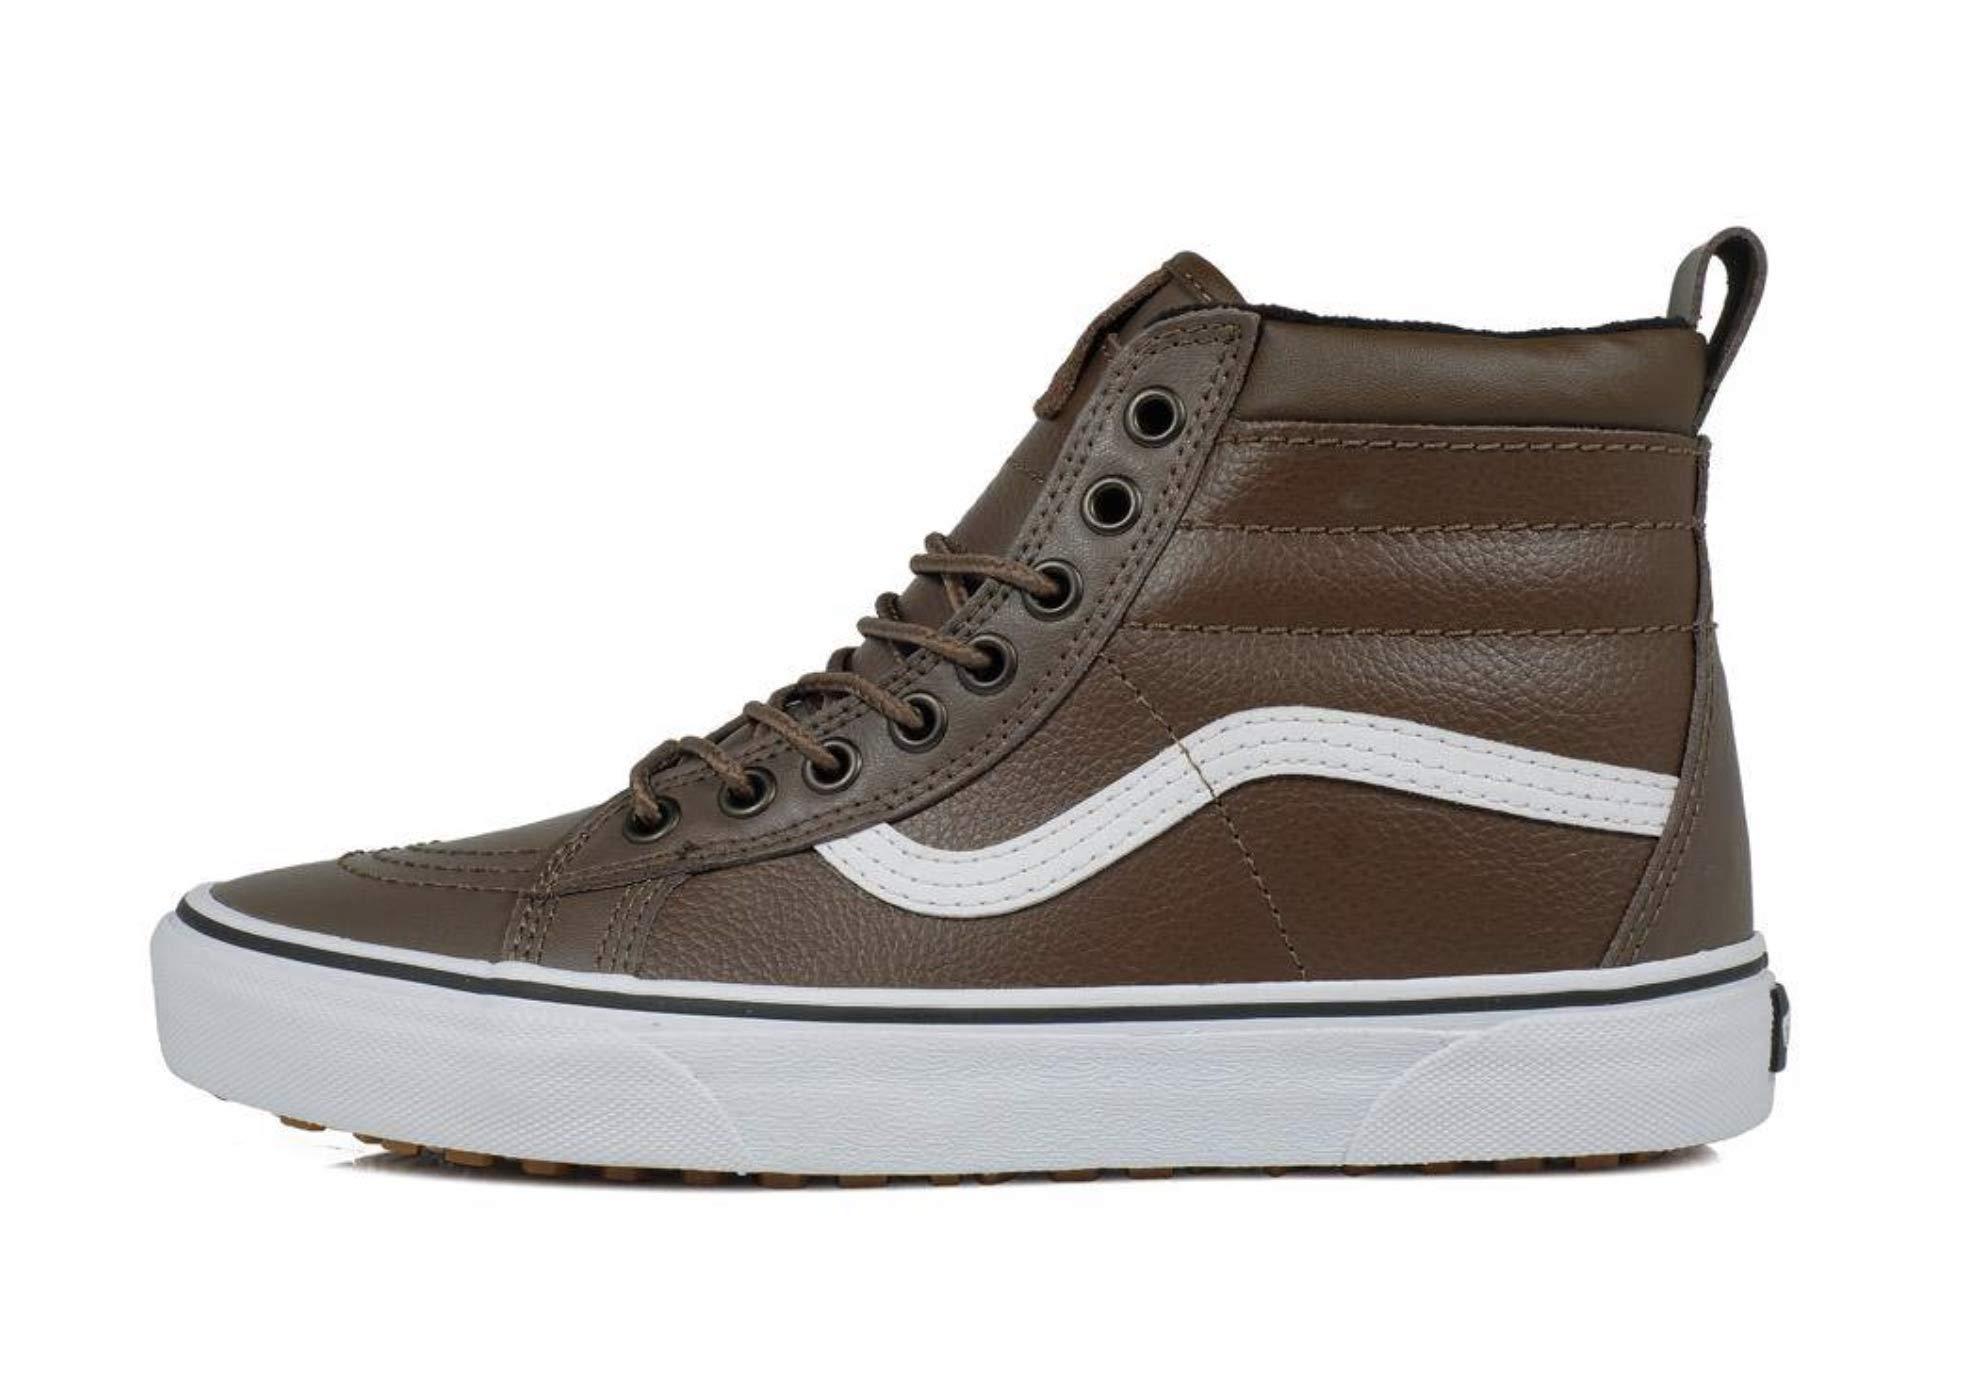 5a7b630491 Galleon - Vans Men s Sk8-Hi MTE Leather Skate Shoe (8 M US